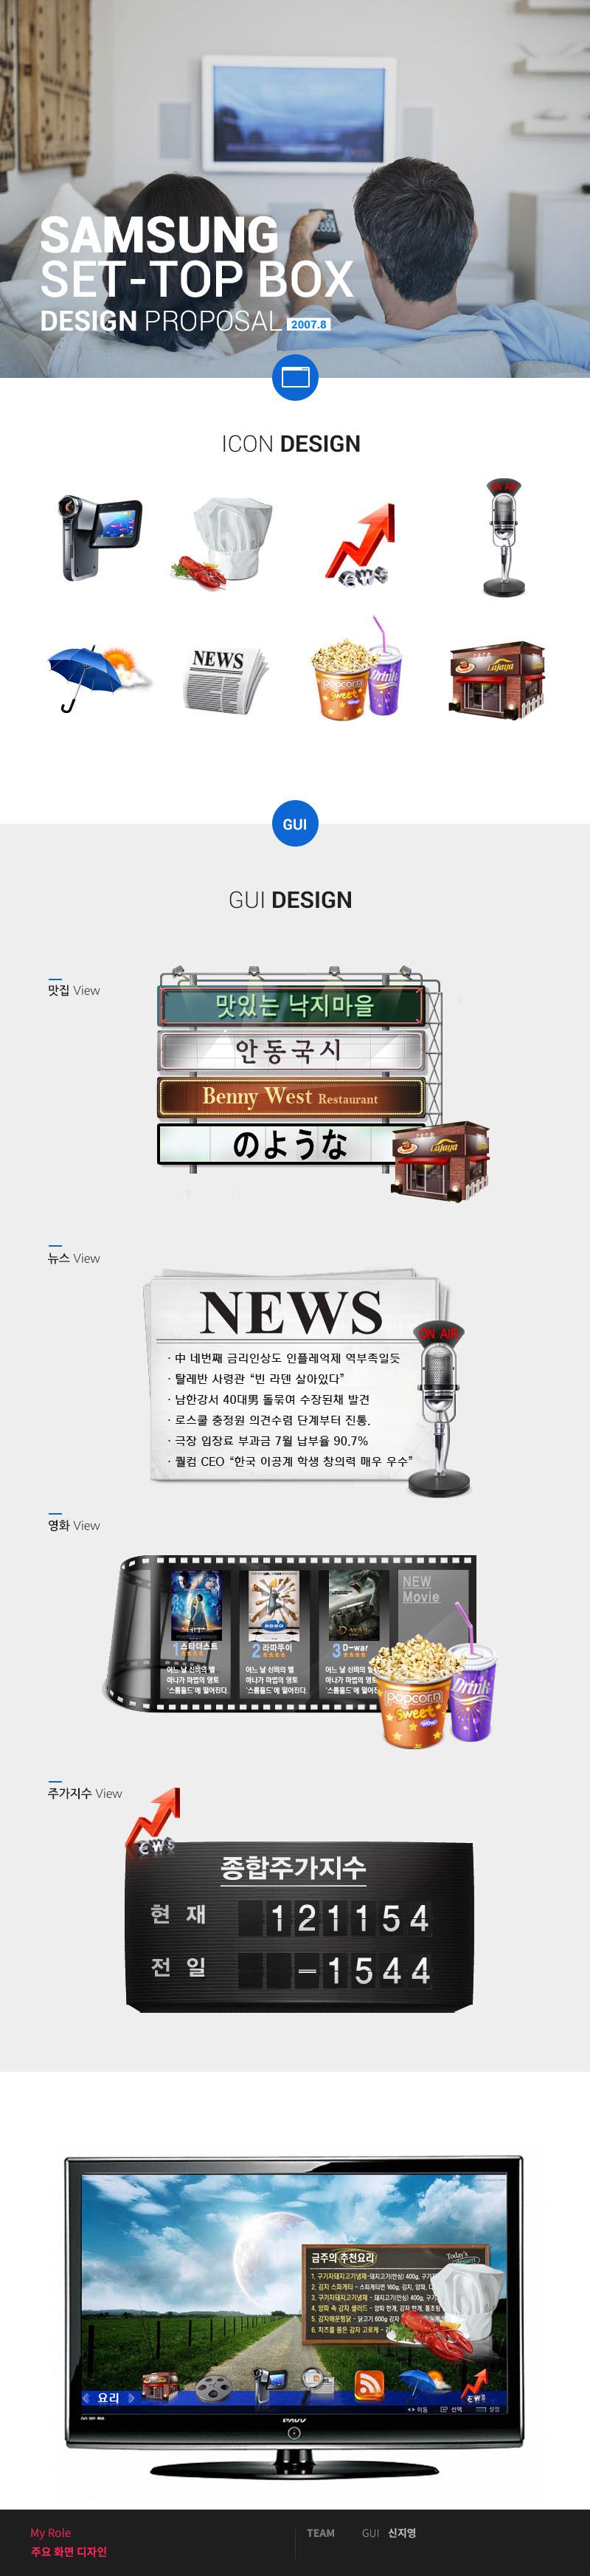 DesignerKang - Samsung Set-top box